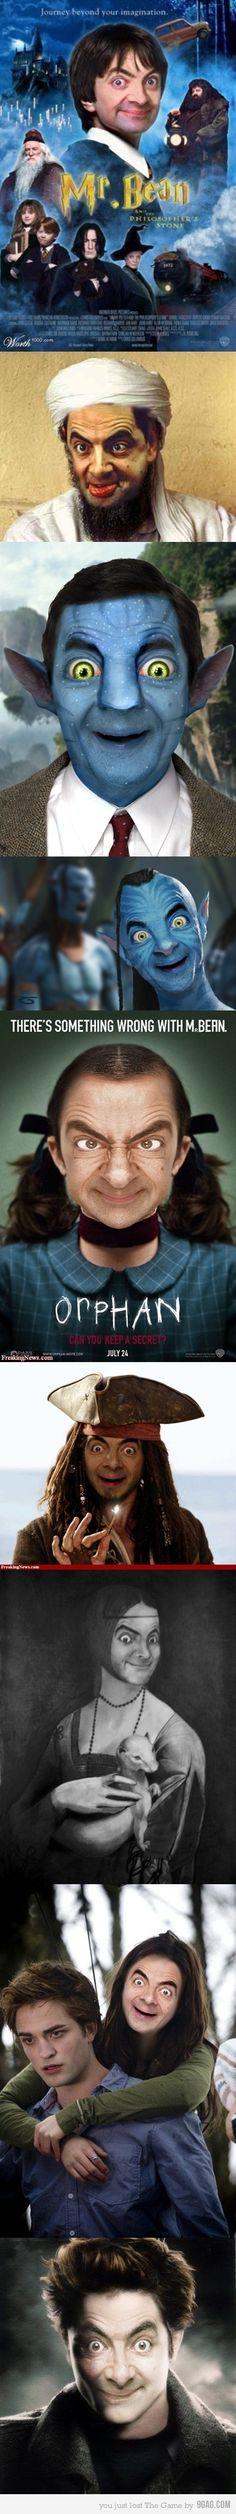 Totally disturbing, but still somehow funny!! LOL!